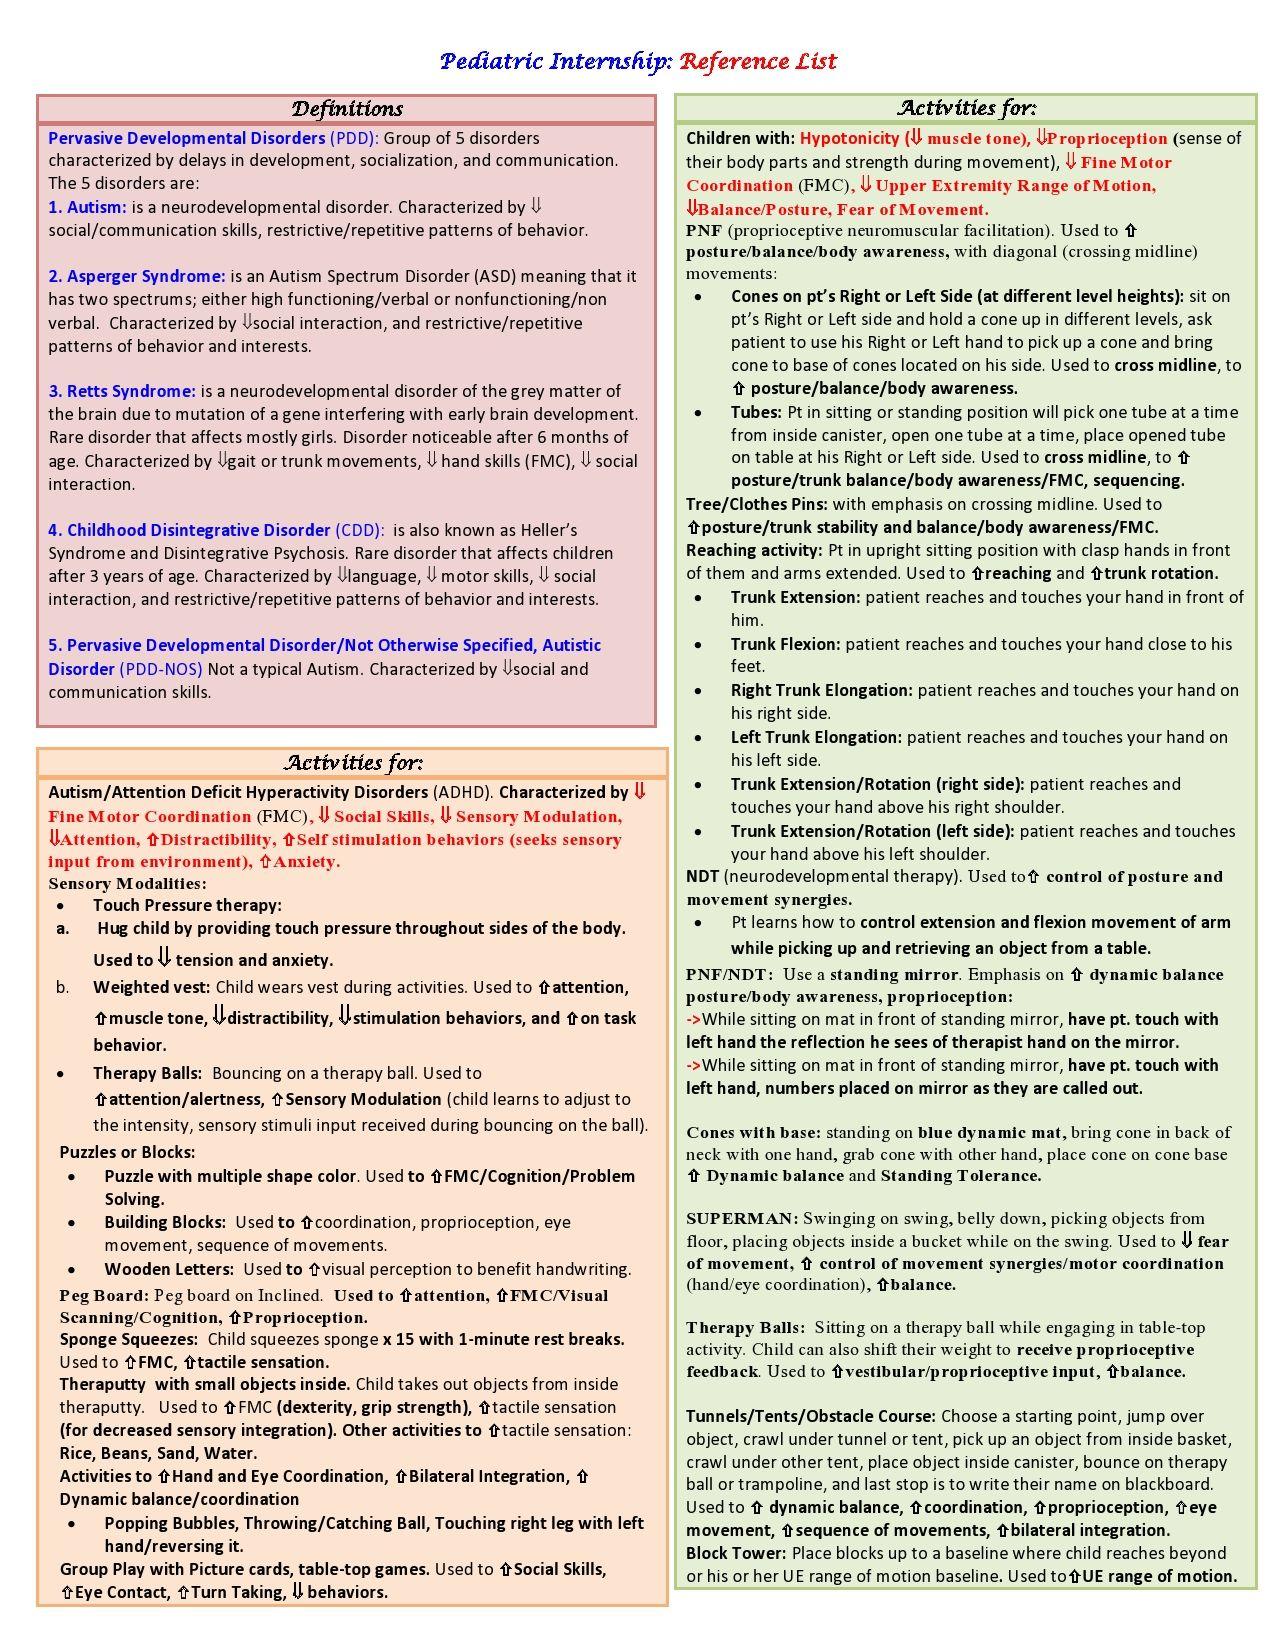 Ot Pediatric Internship Reference List Page 1